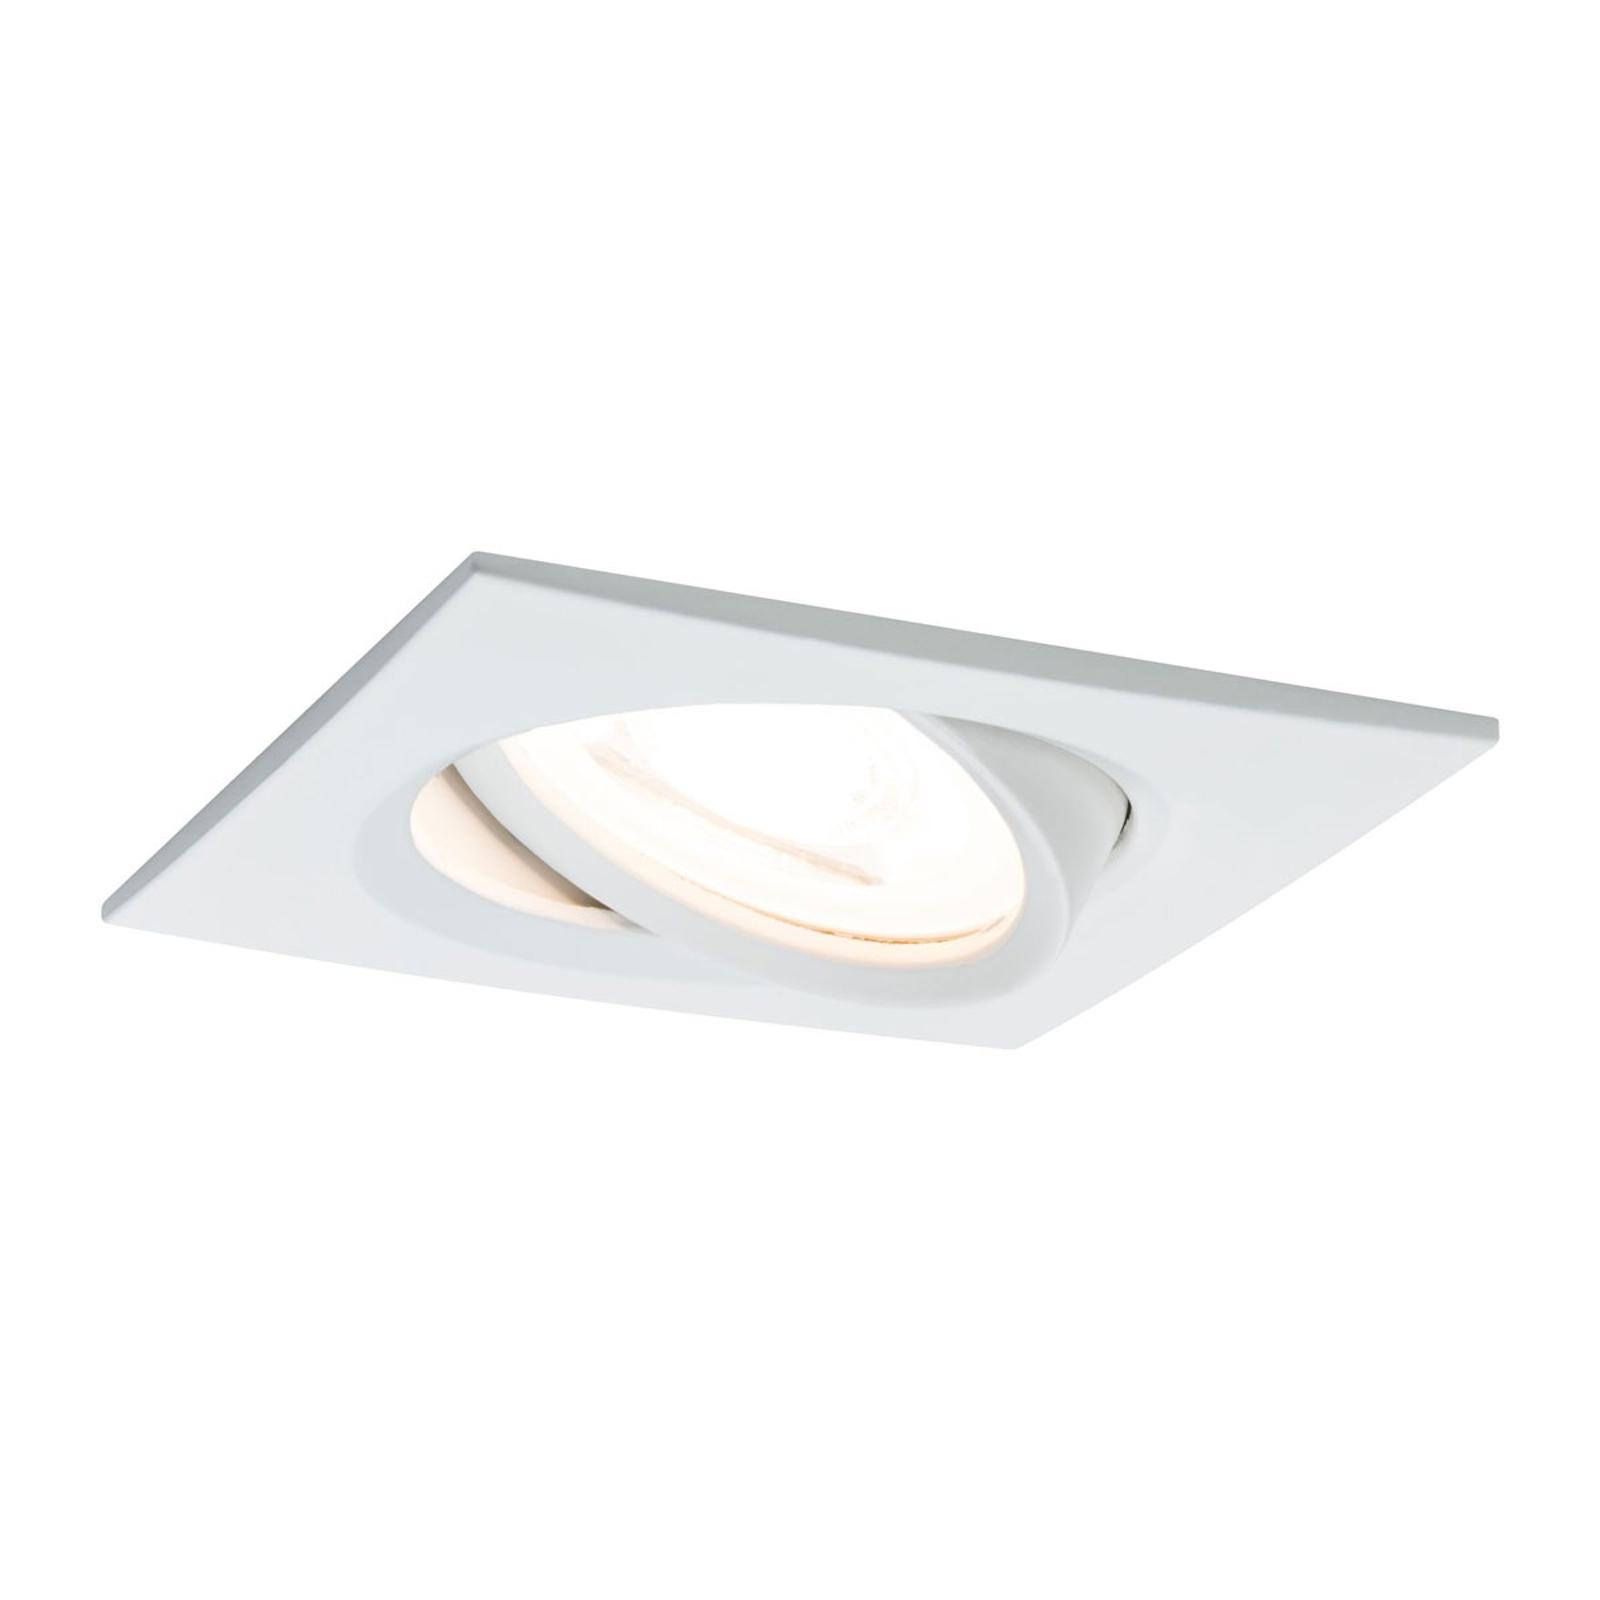 Paulmann LED-spot Nova Coin kantig, dimbar, vit